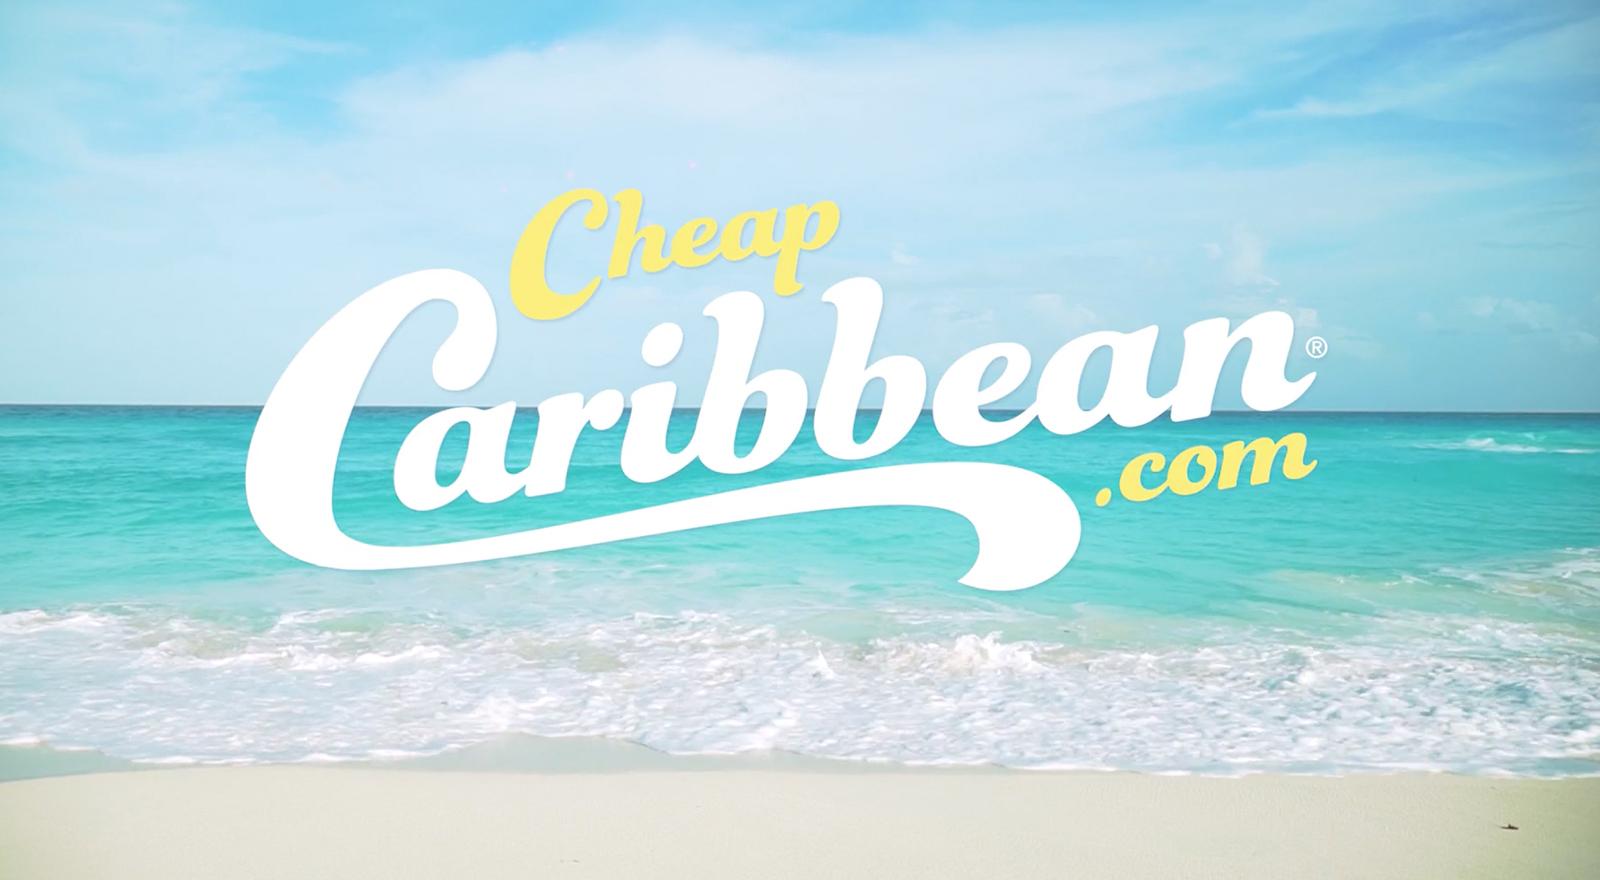 Cheapcaribbean.com logo